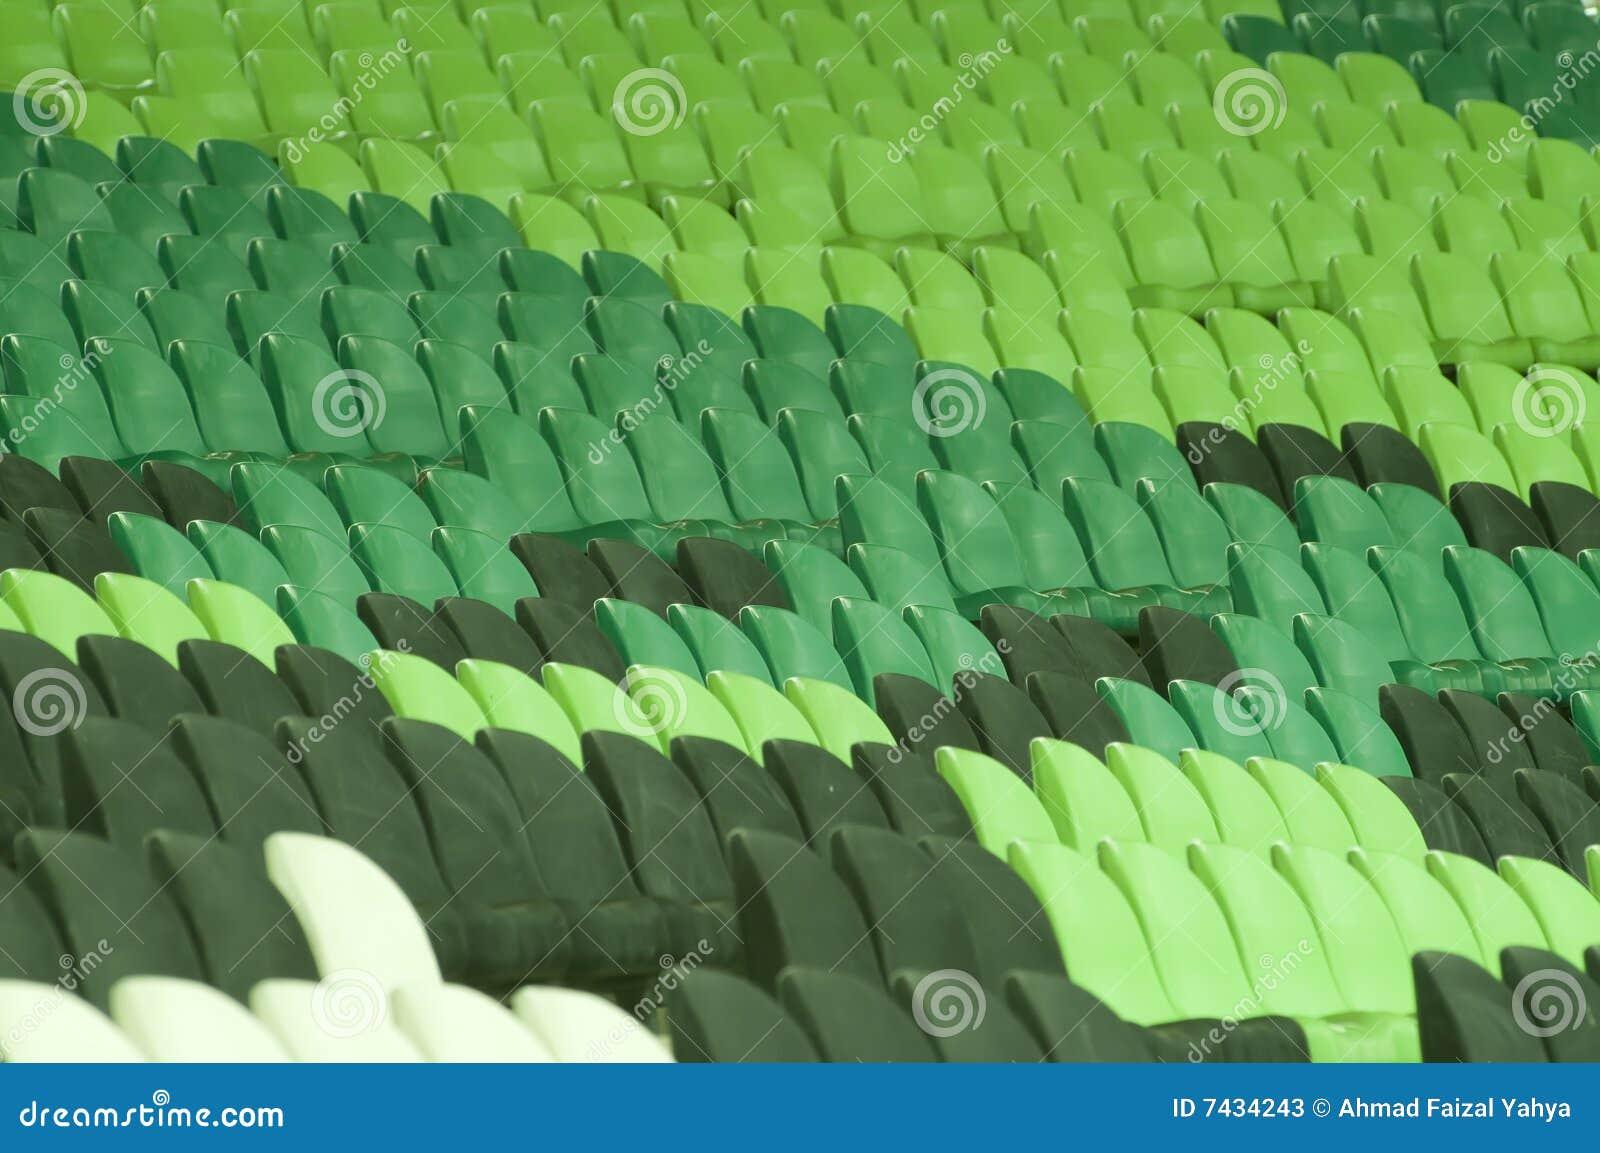 Vacant stadium seats